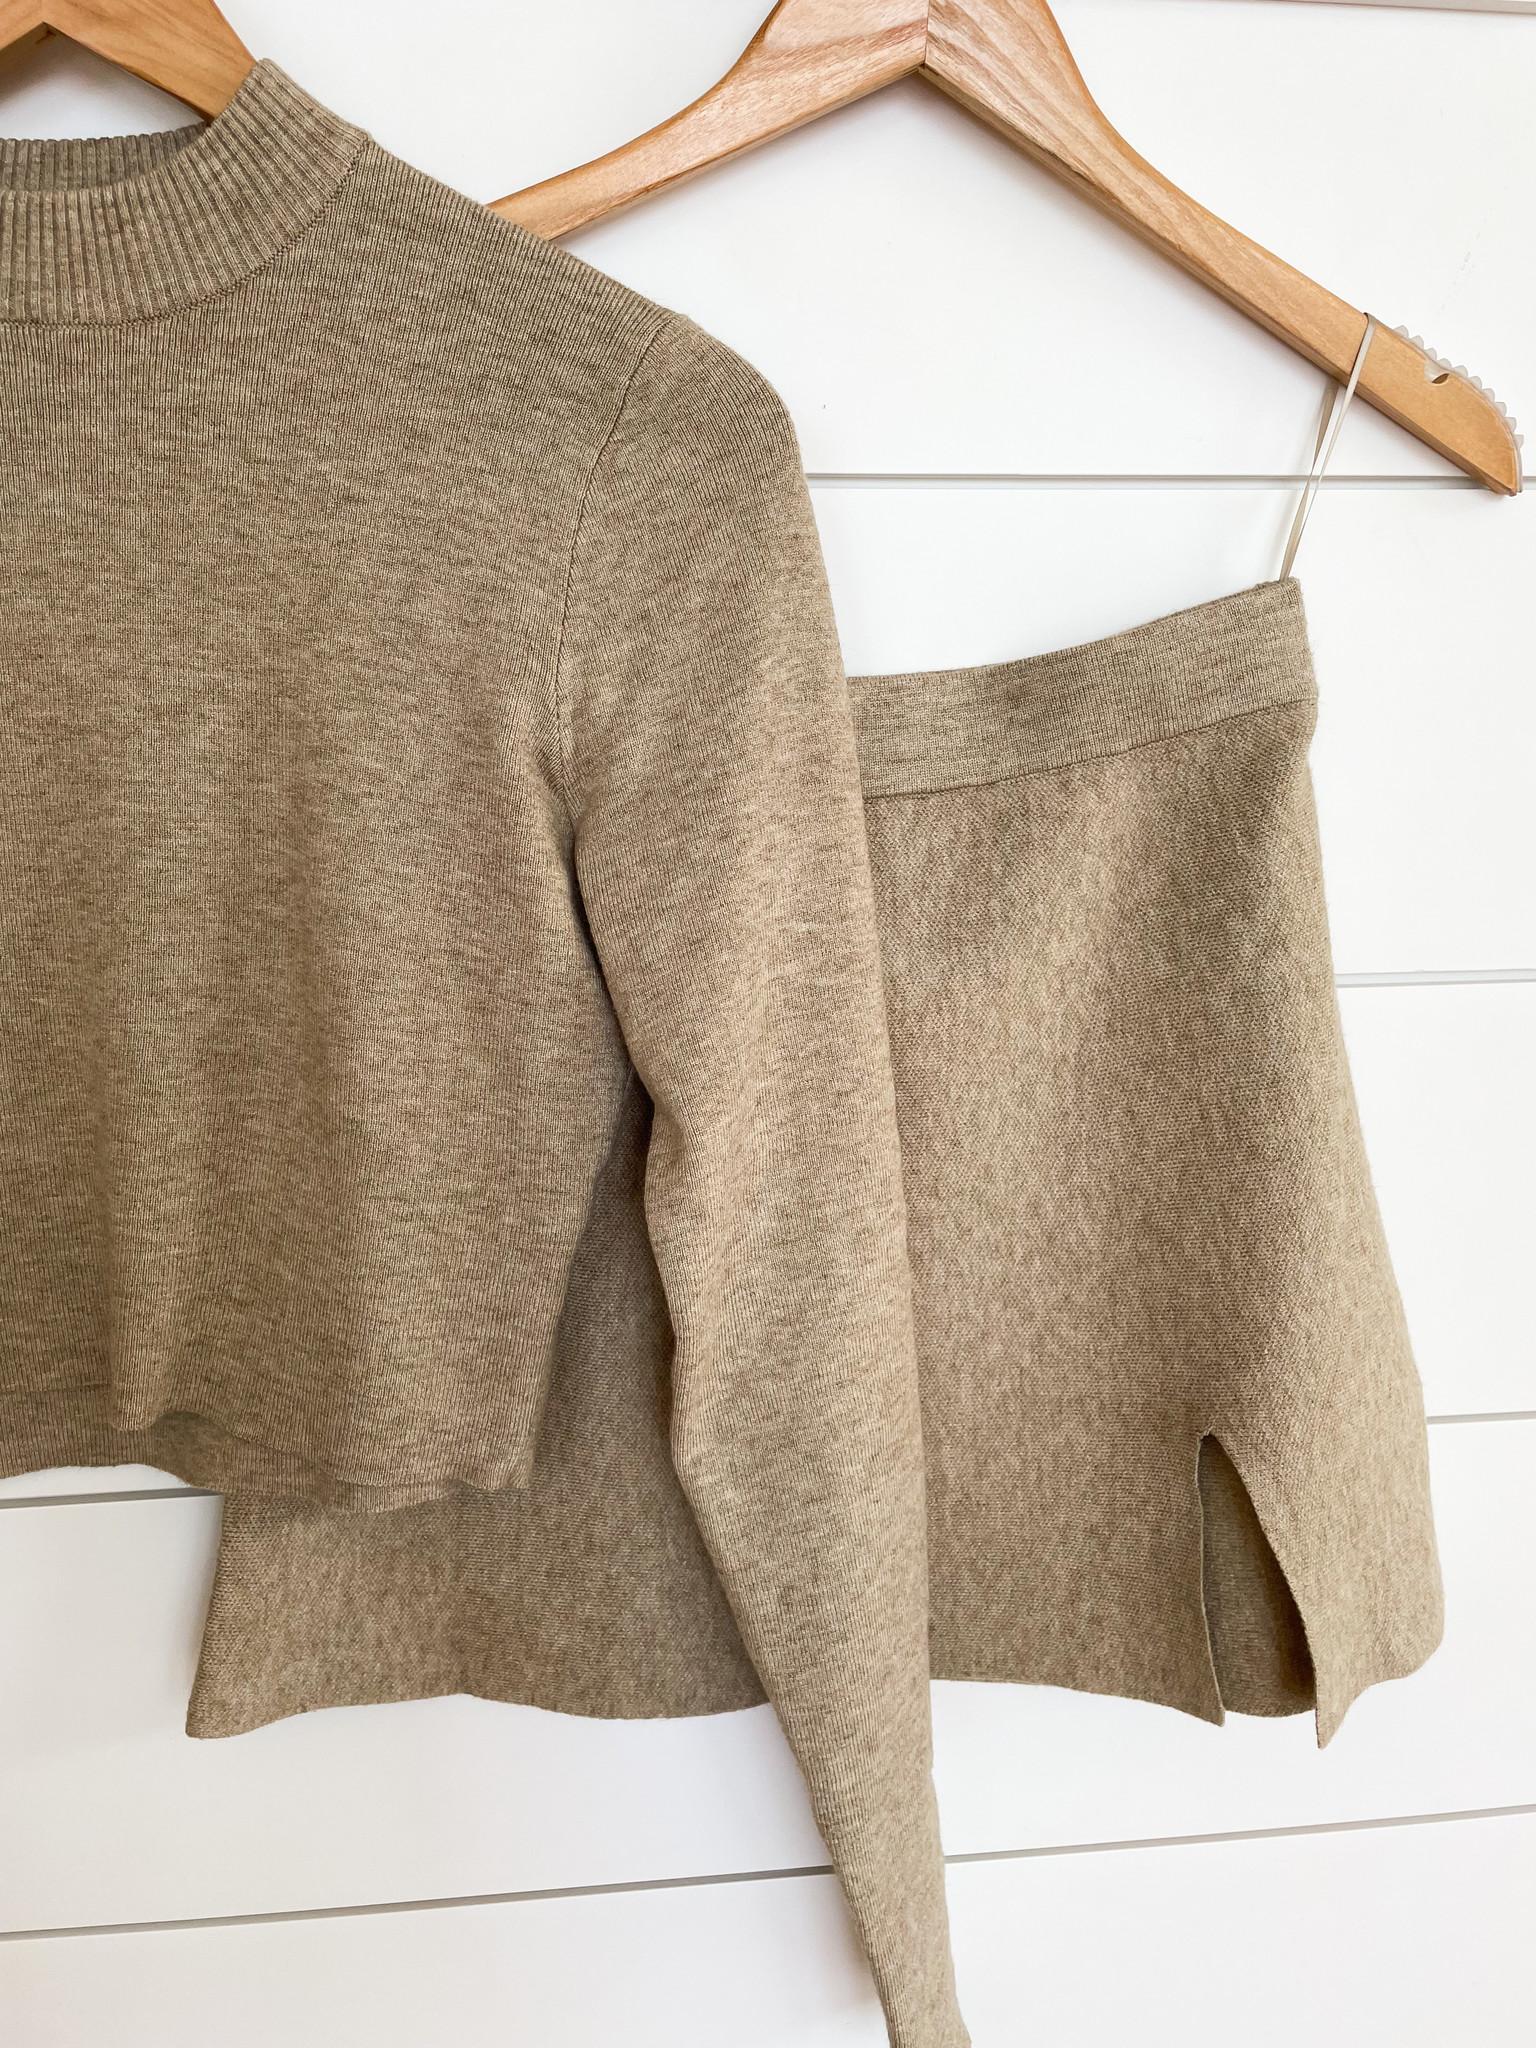 Sweater Mock Neck Crop Top & Slit Mini Skirt Set